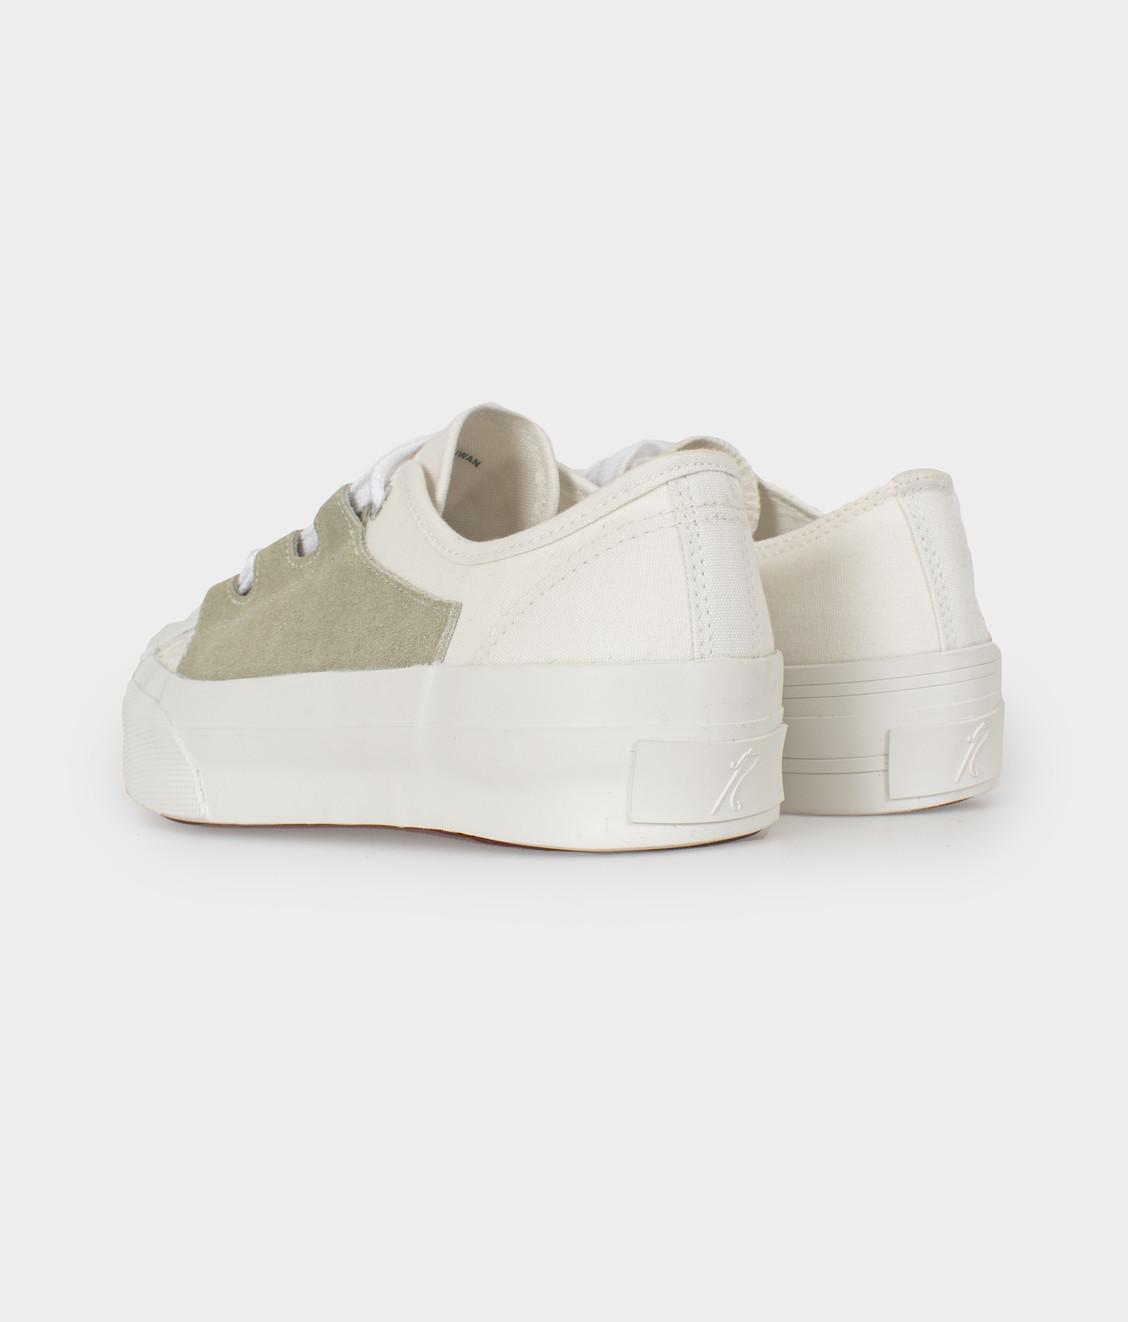 Needles Needles Asymmetric Ghillie Sneaker White